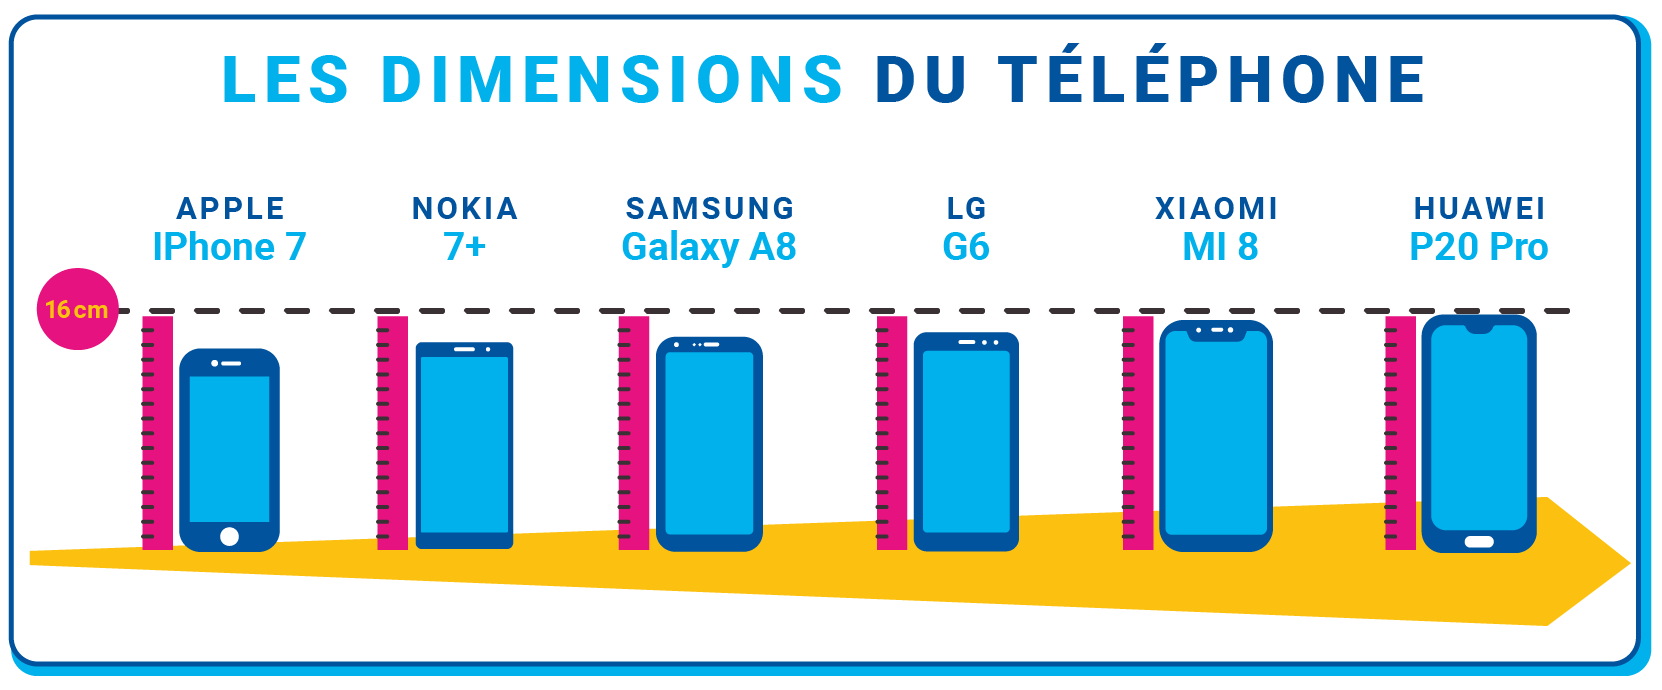 Dimensions des différents smartphones